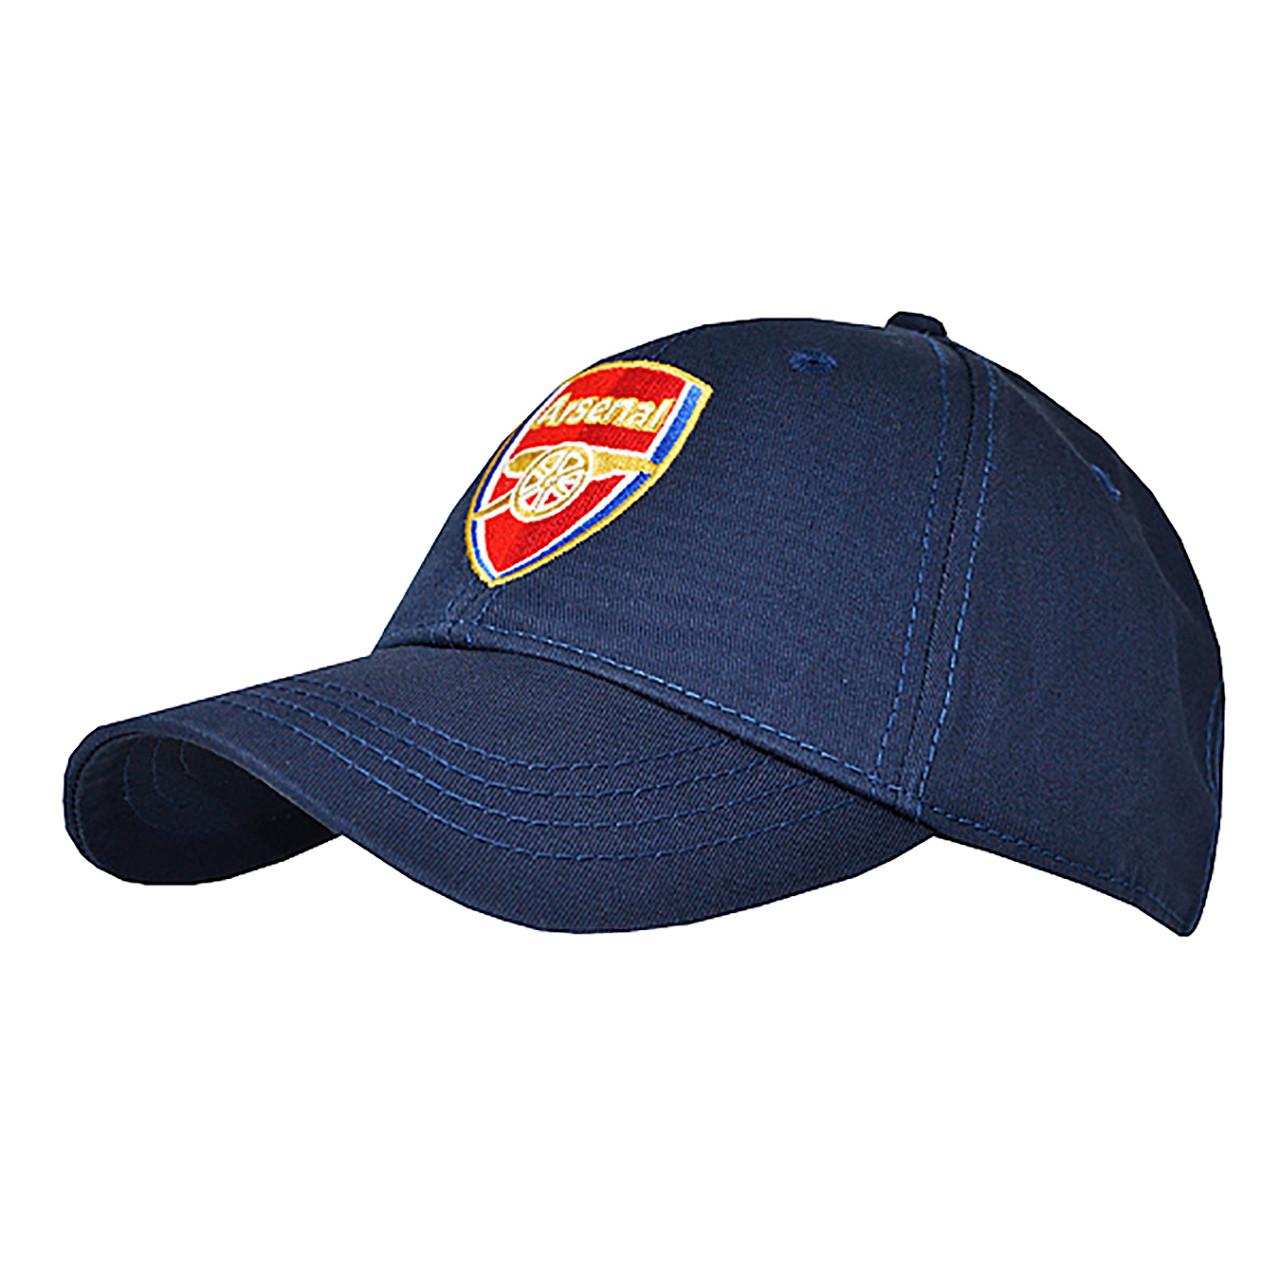 Arsenal FC Official EPL Baseball Cap 7511a2fb483